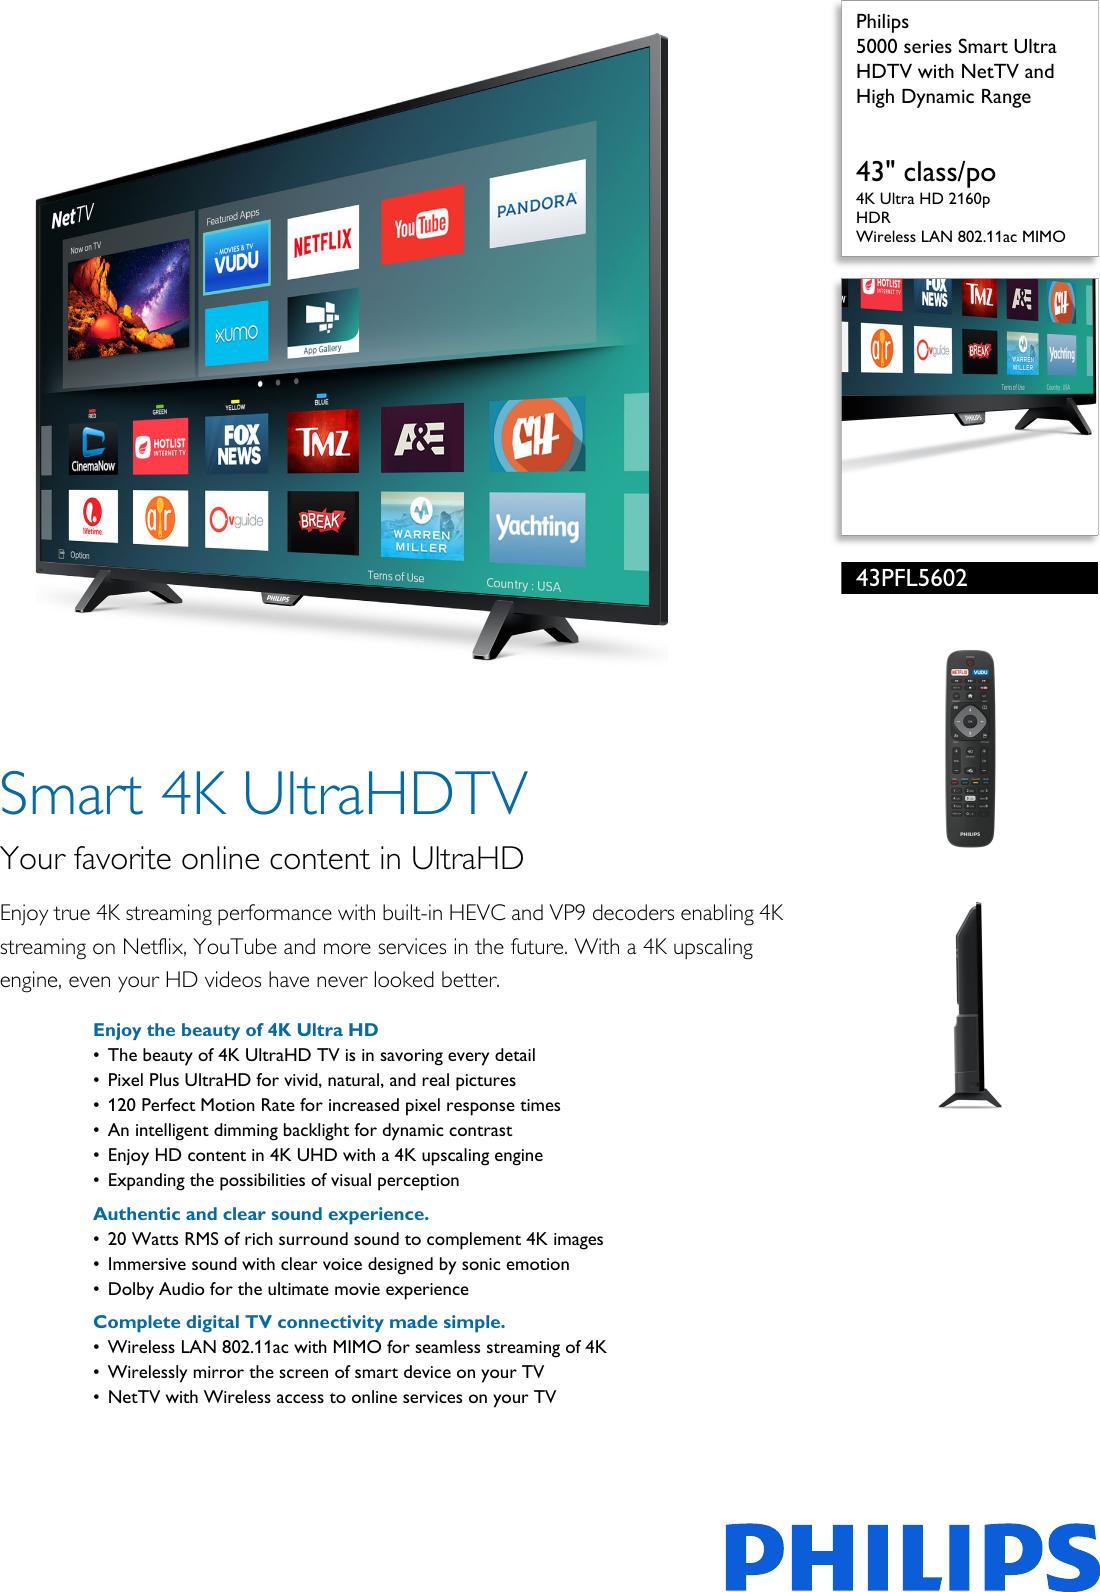 Philips 43PFL5602/F7 5000 Series Smart Ultra HDTV With NetTV